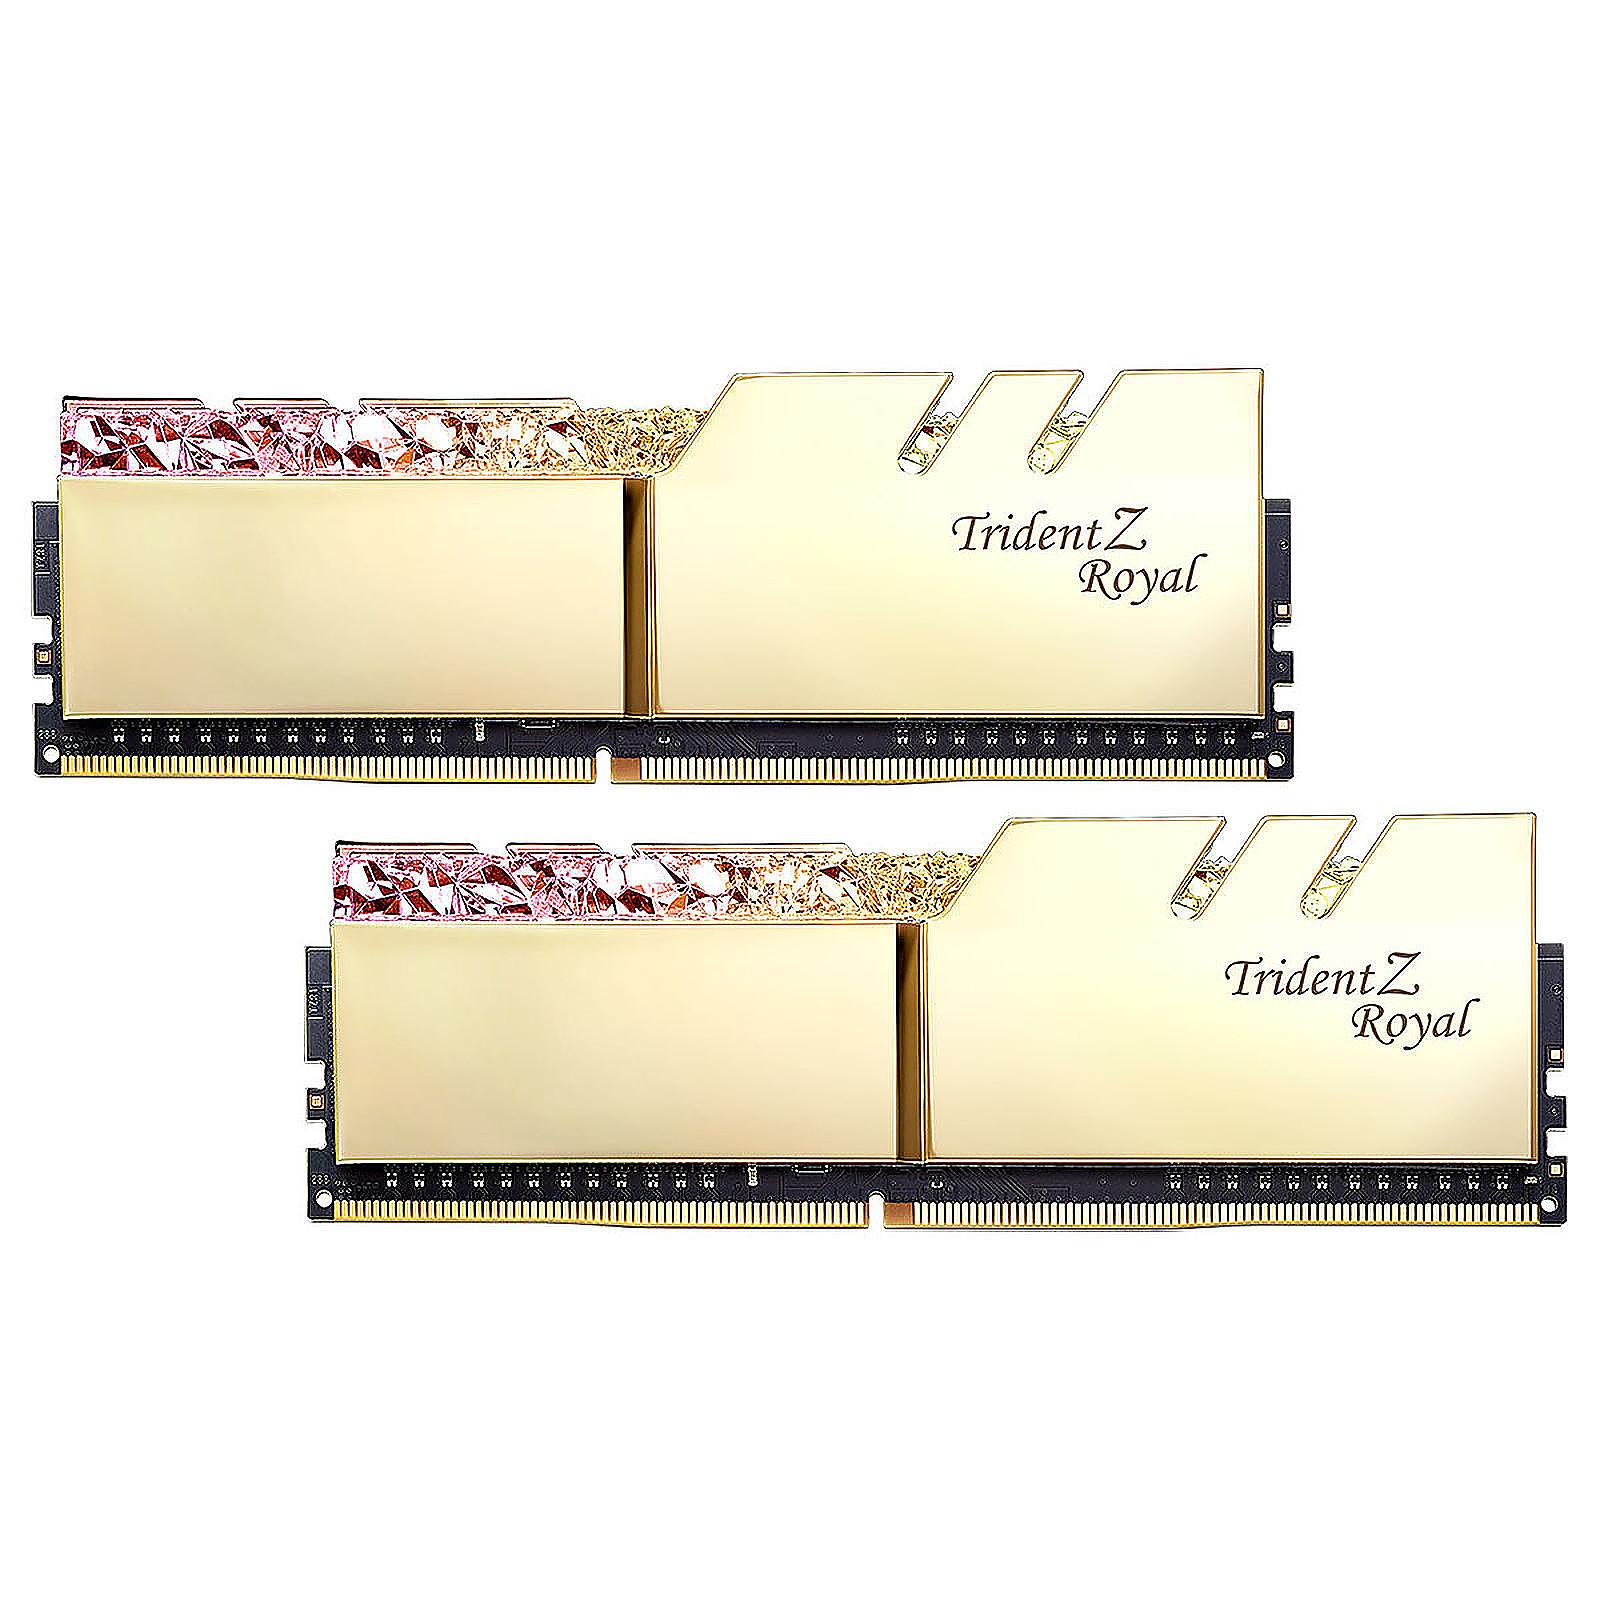 G.Skill Trident Z Royal 64 Go (2 x 32 Go) DDR4 2666 MHz CL18 - Or